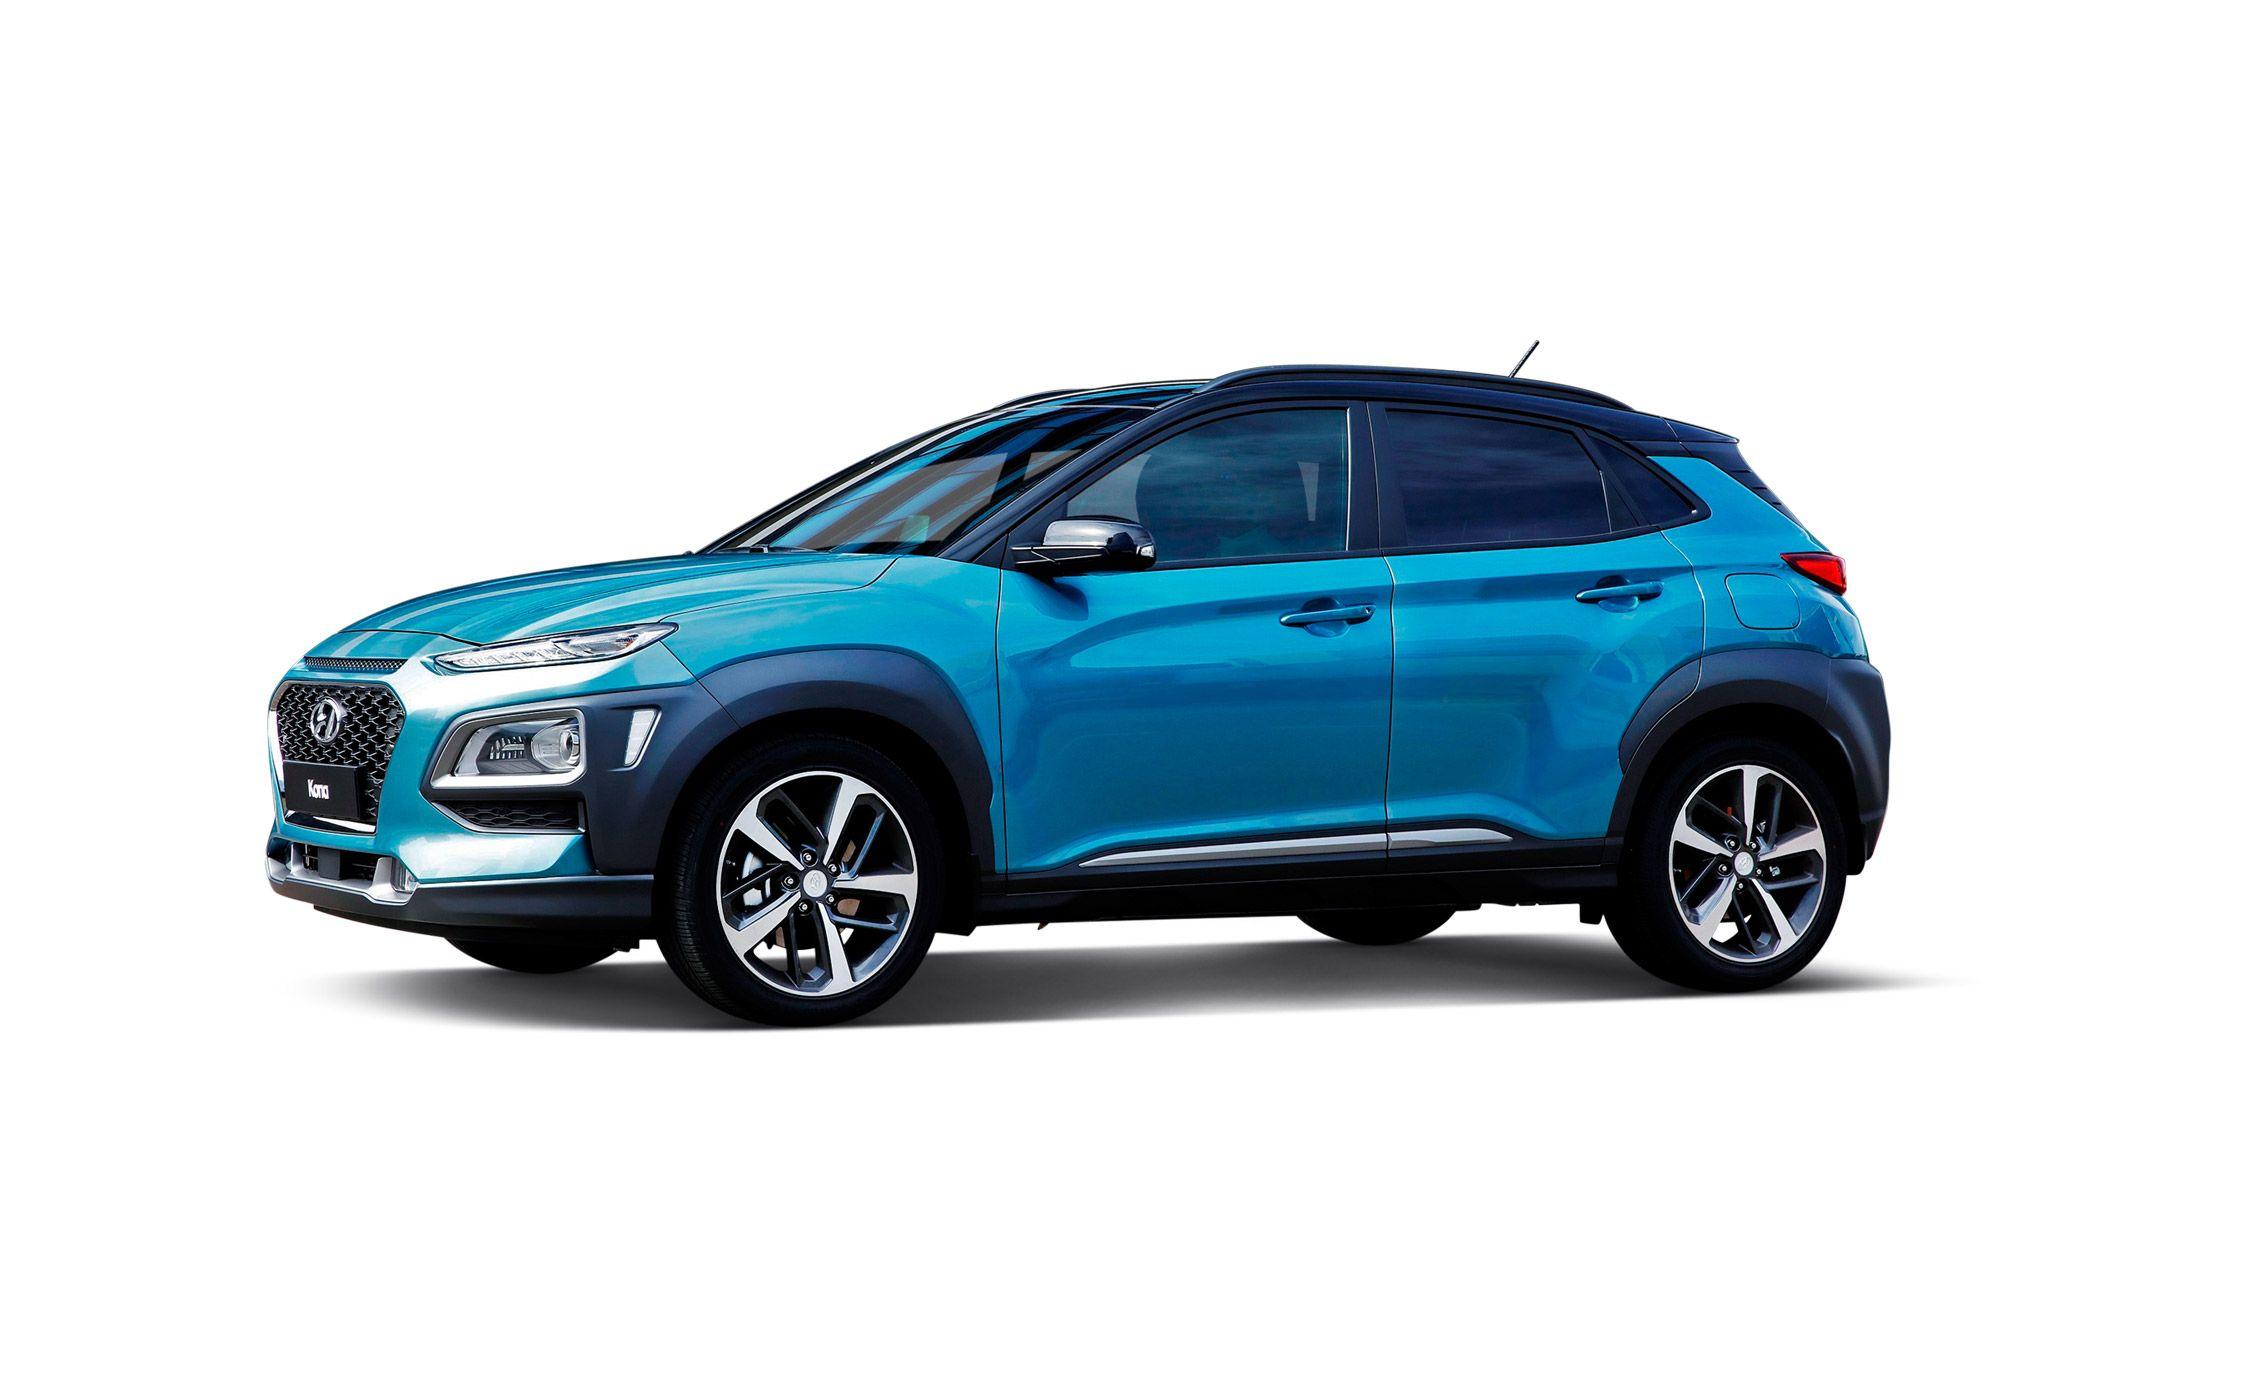 New Cars for 2018: Hyundai